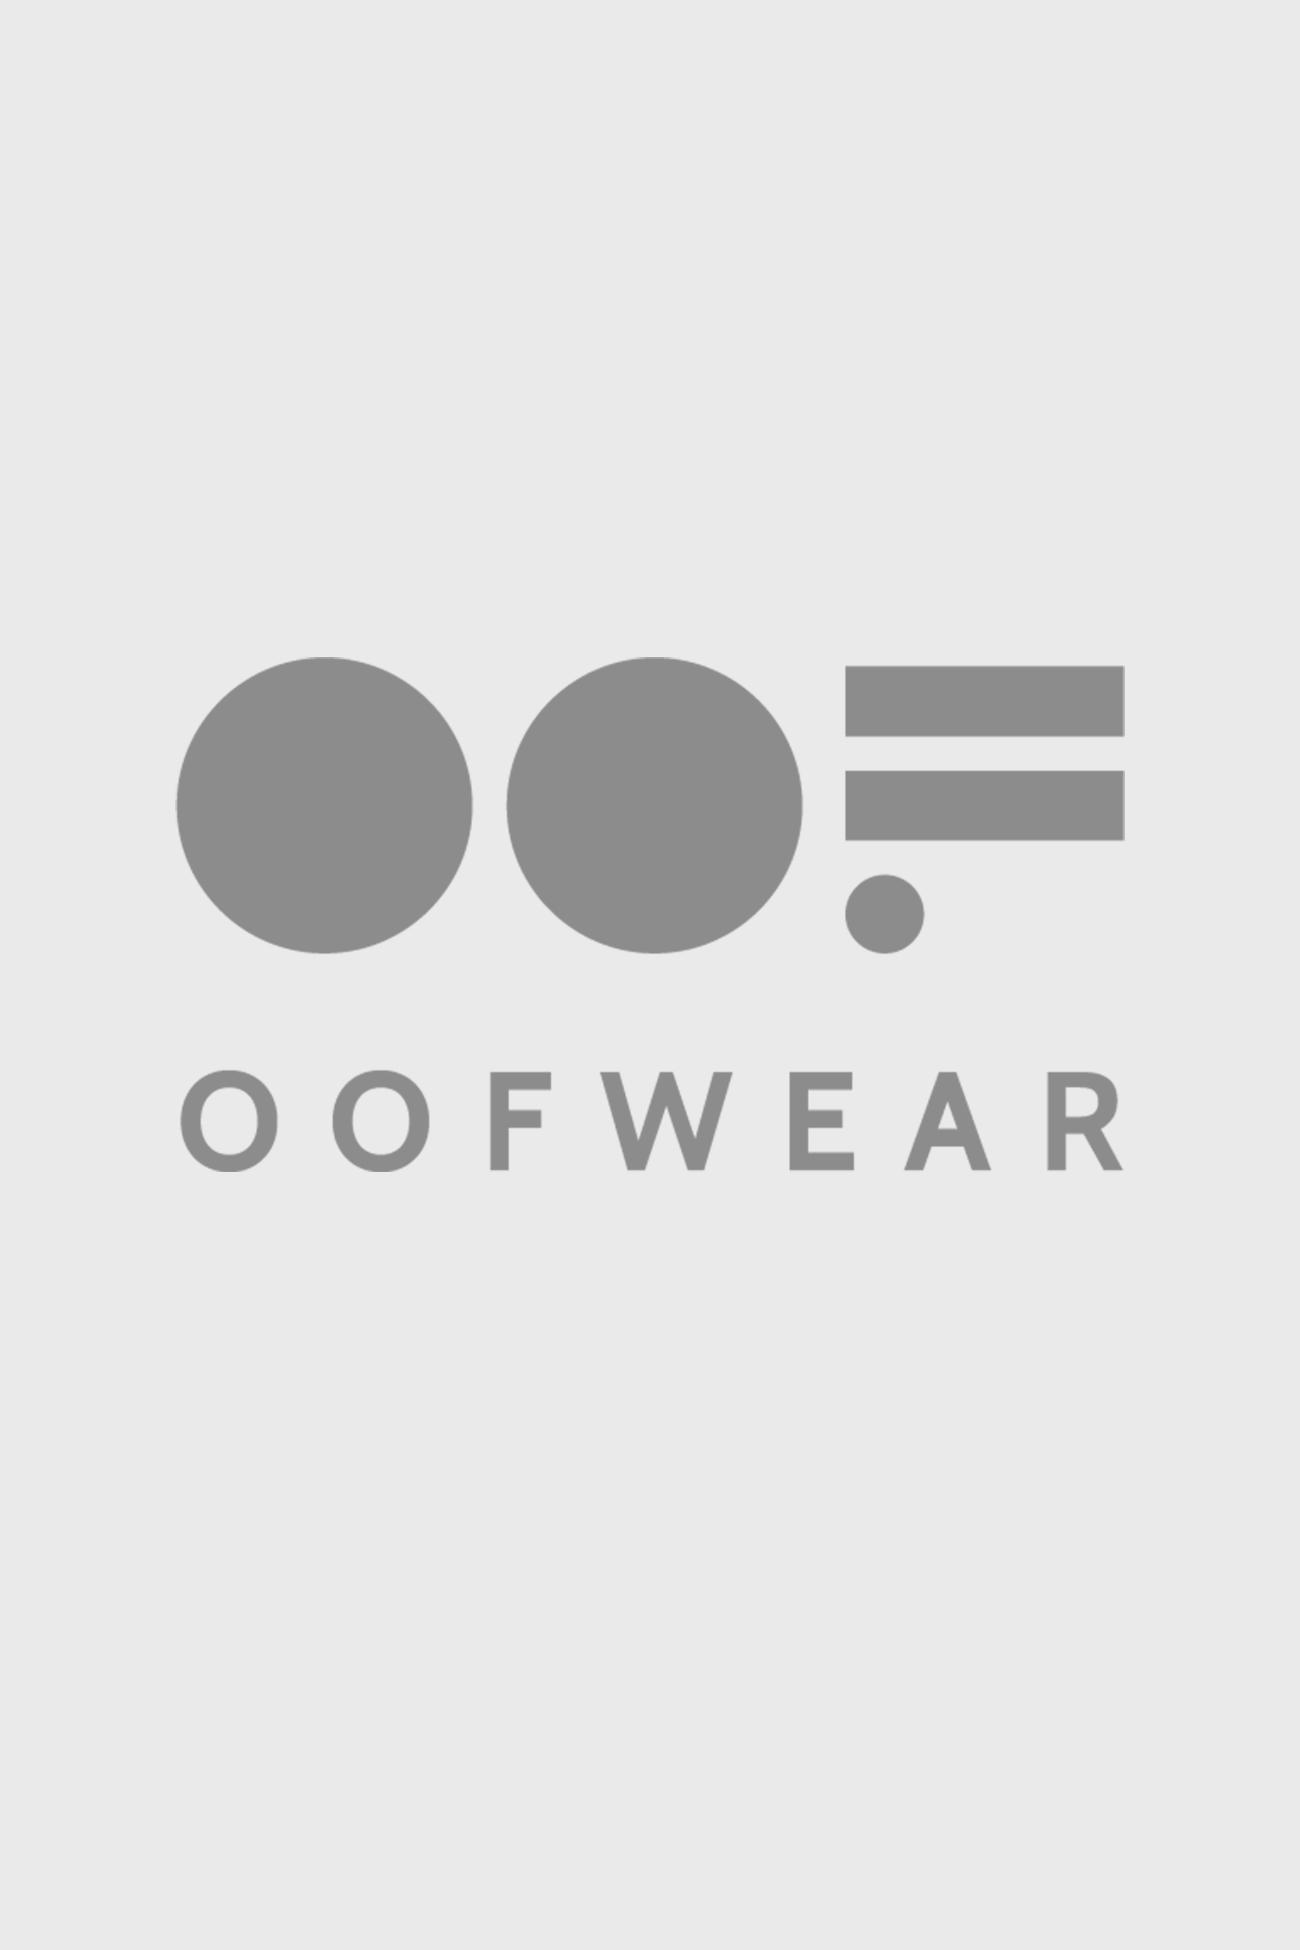 Long gilet 9004 in powder faux fur